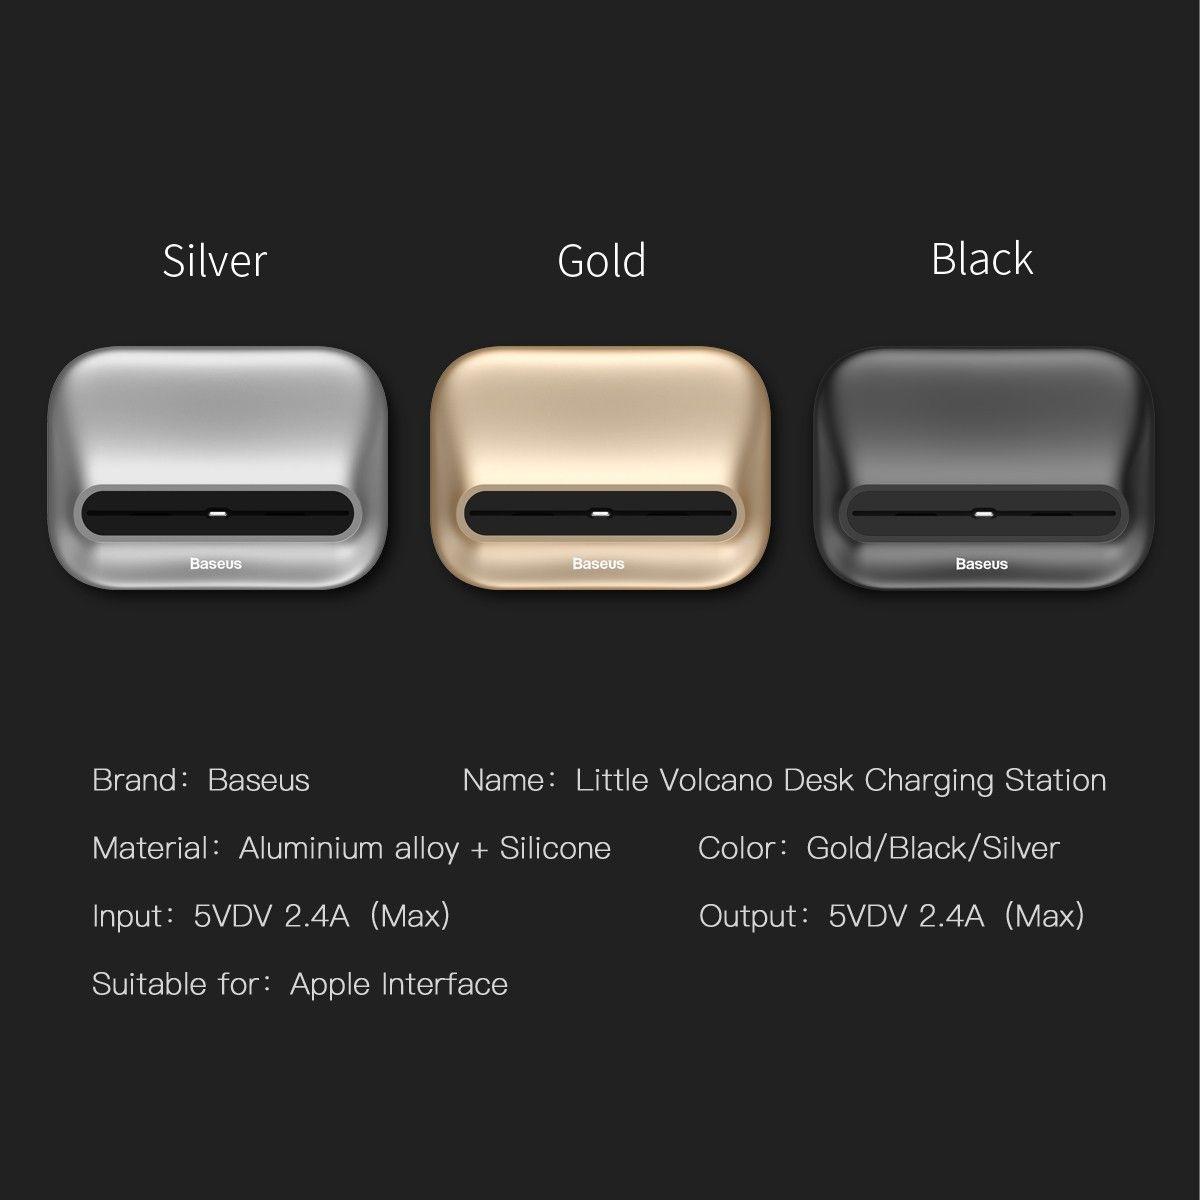 Baseus aluminium alloy desktop charging station for iphone